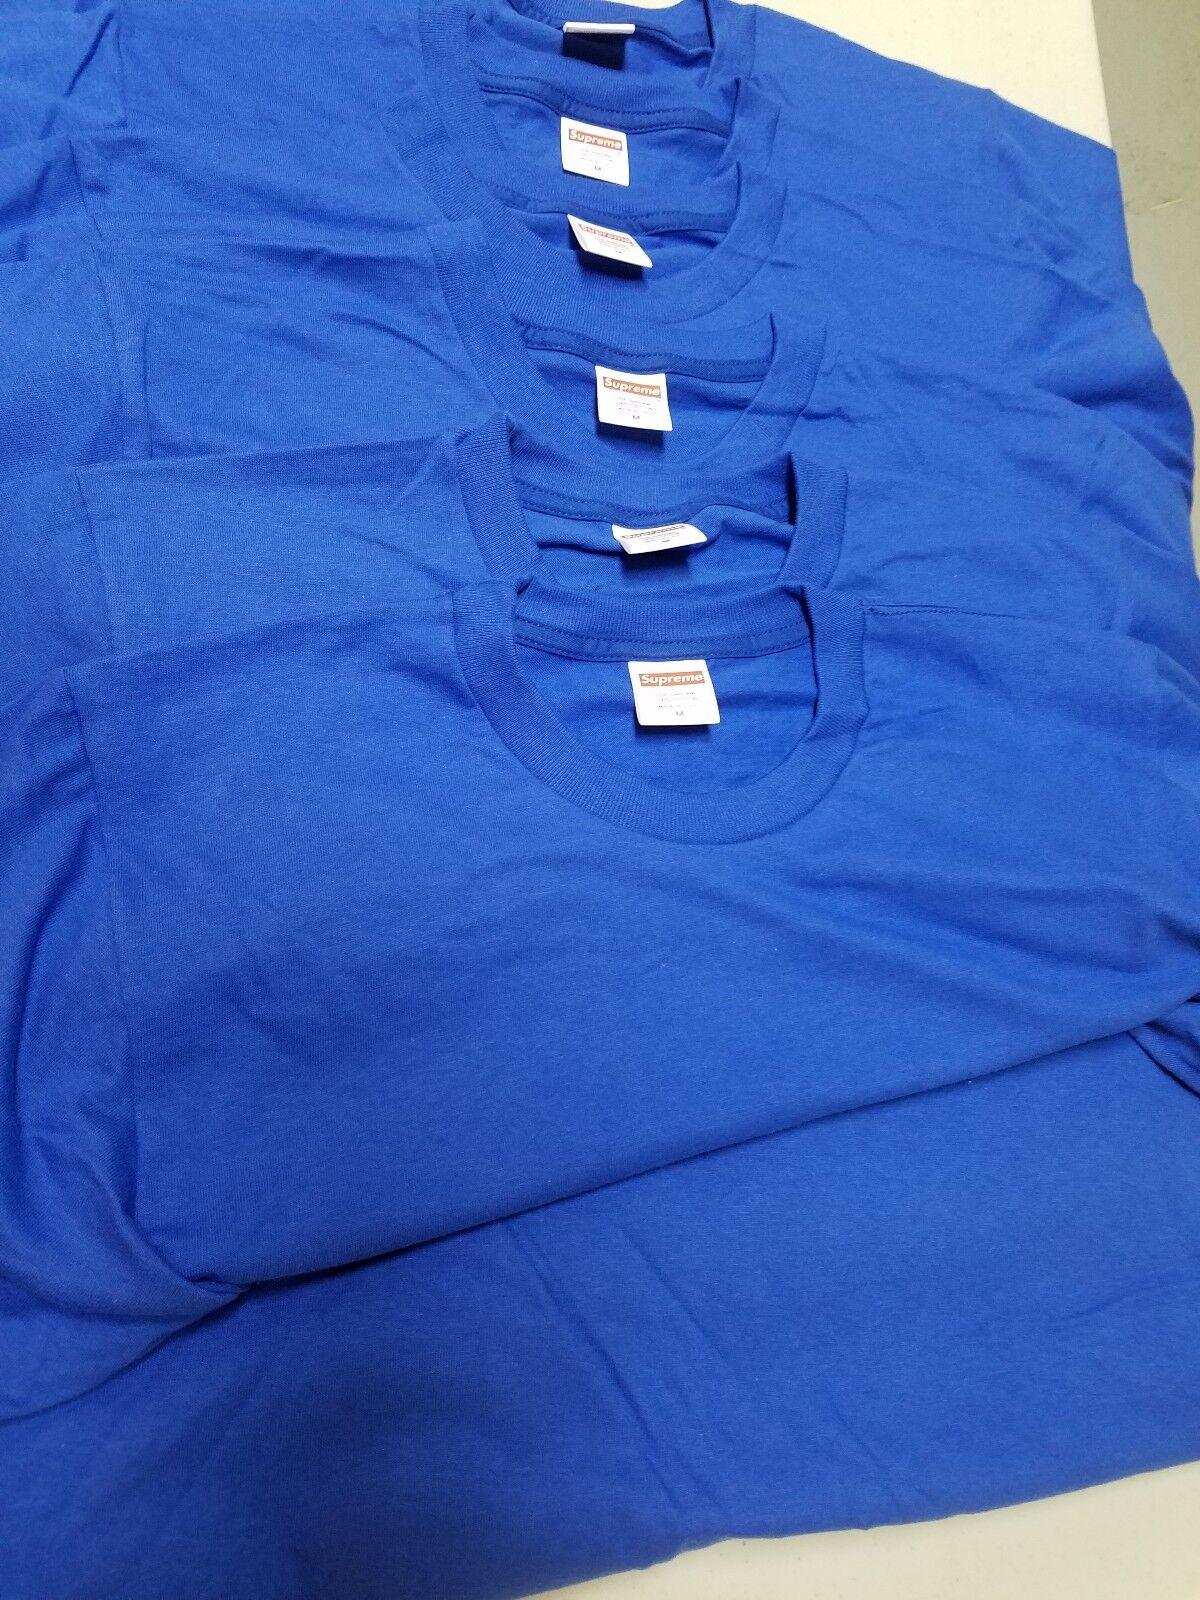 Lots of 6 Supreme Blank Royal blueeT-shirts Medium